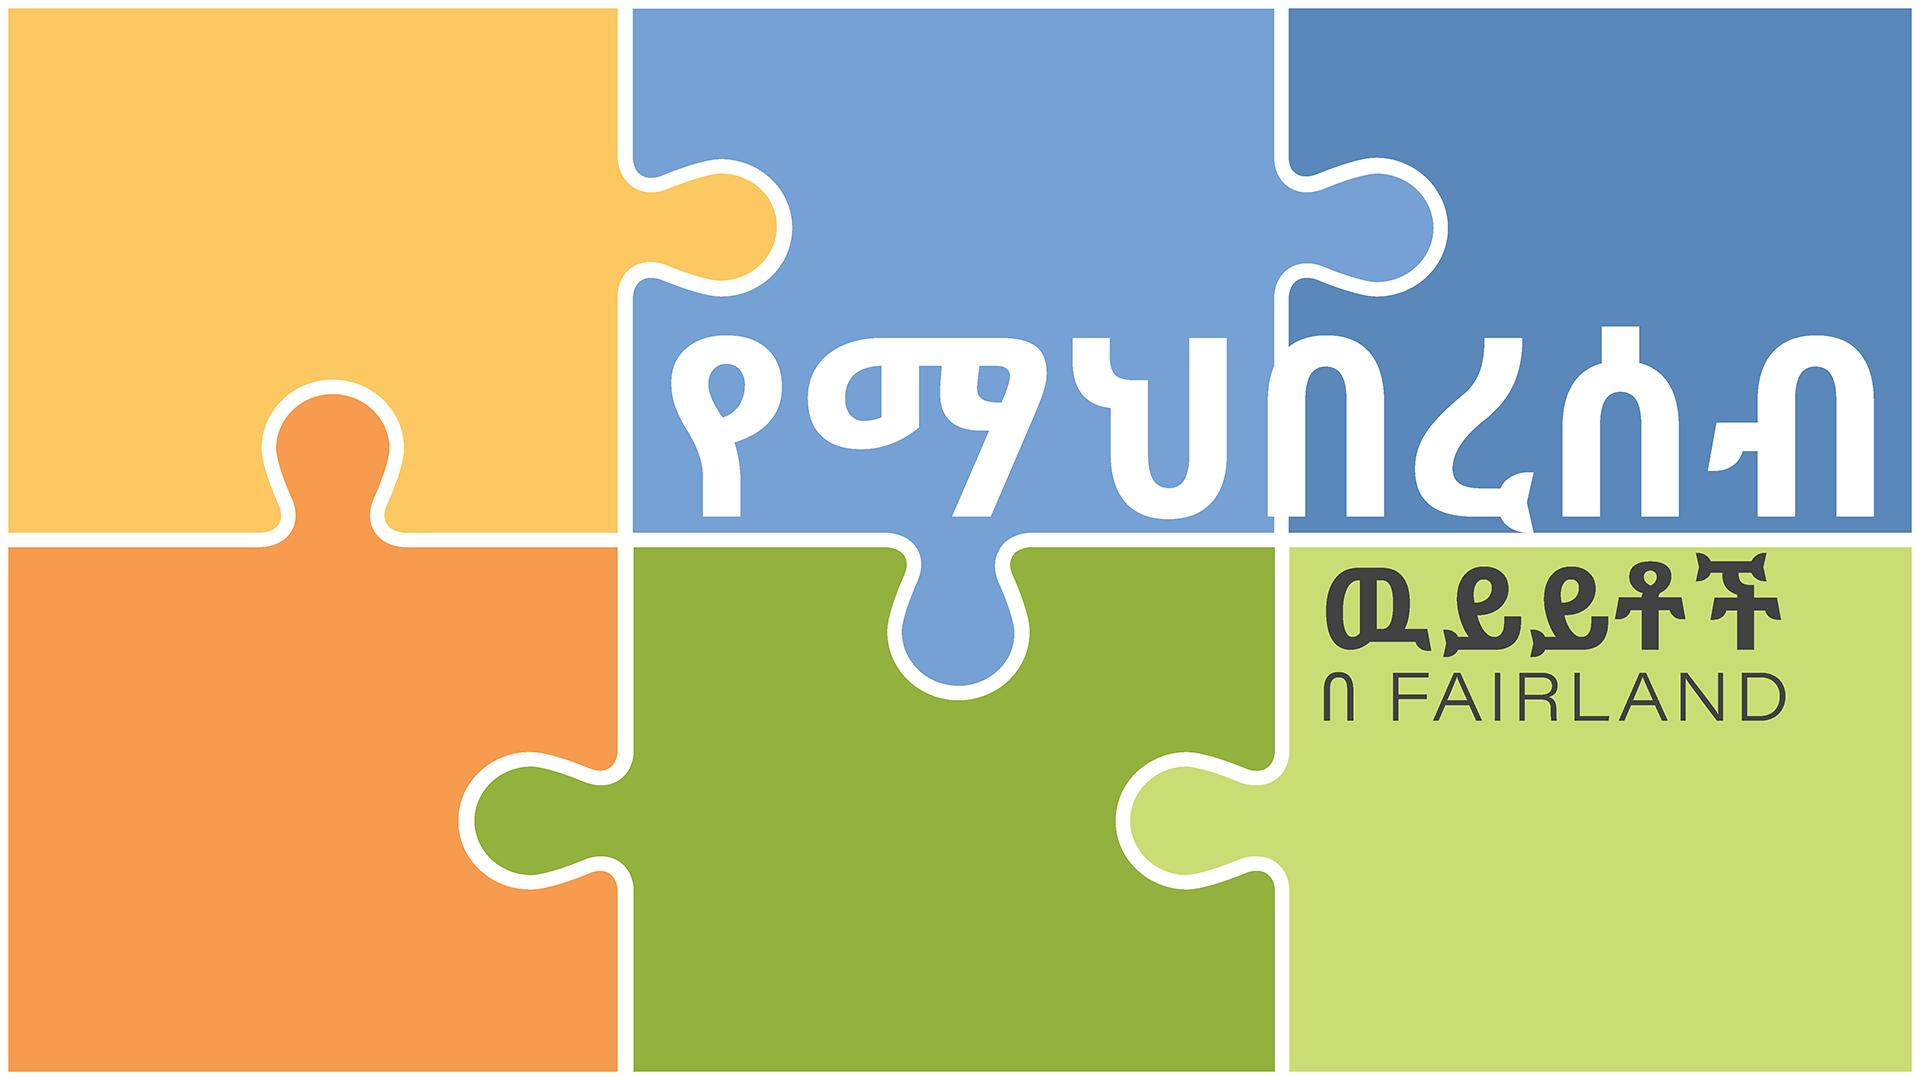 CommUNITY Conversations in Fairland Amharic